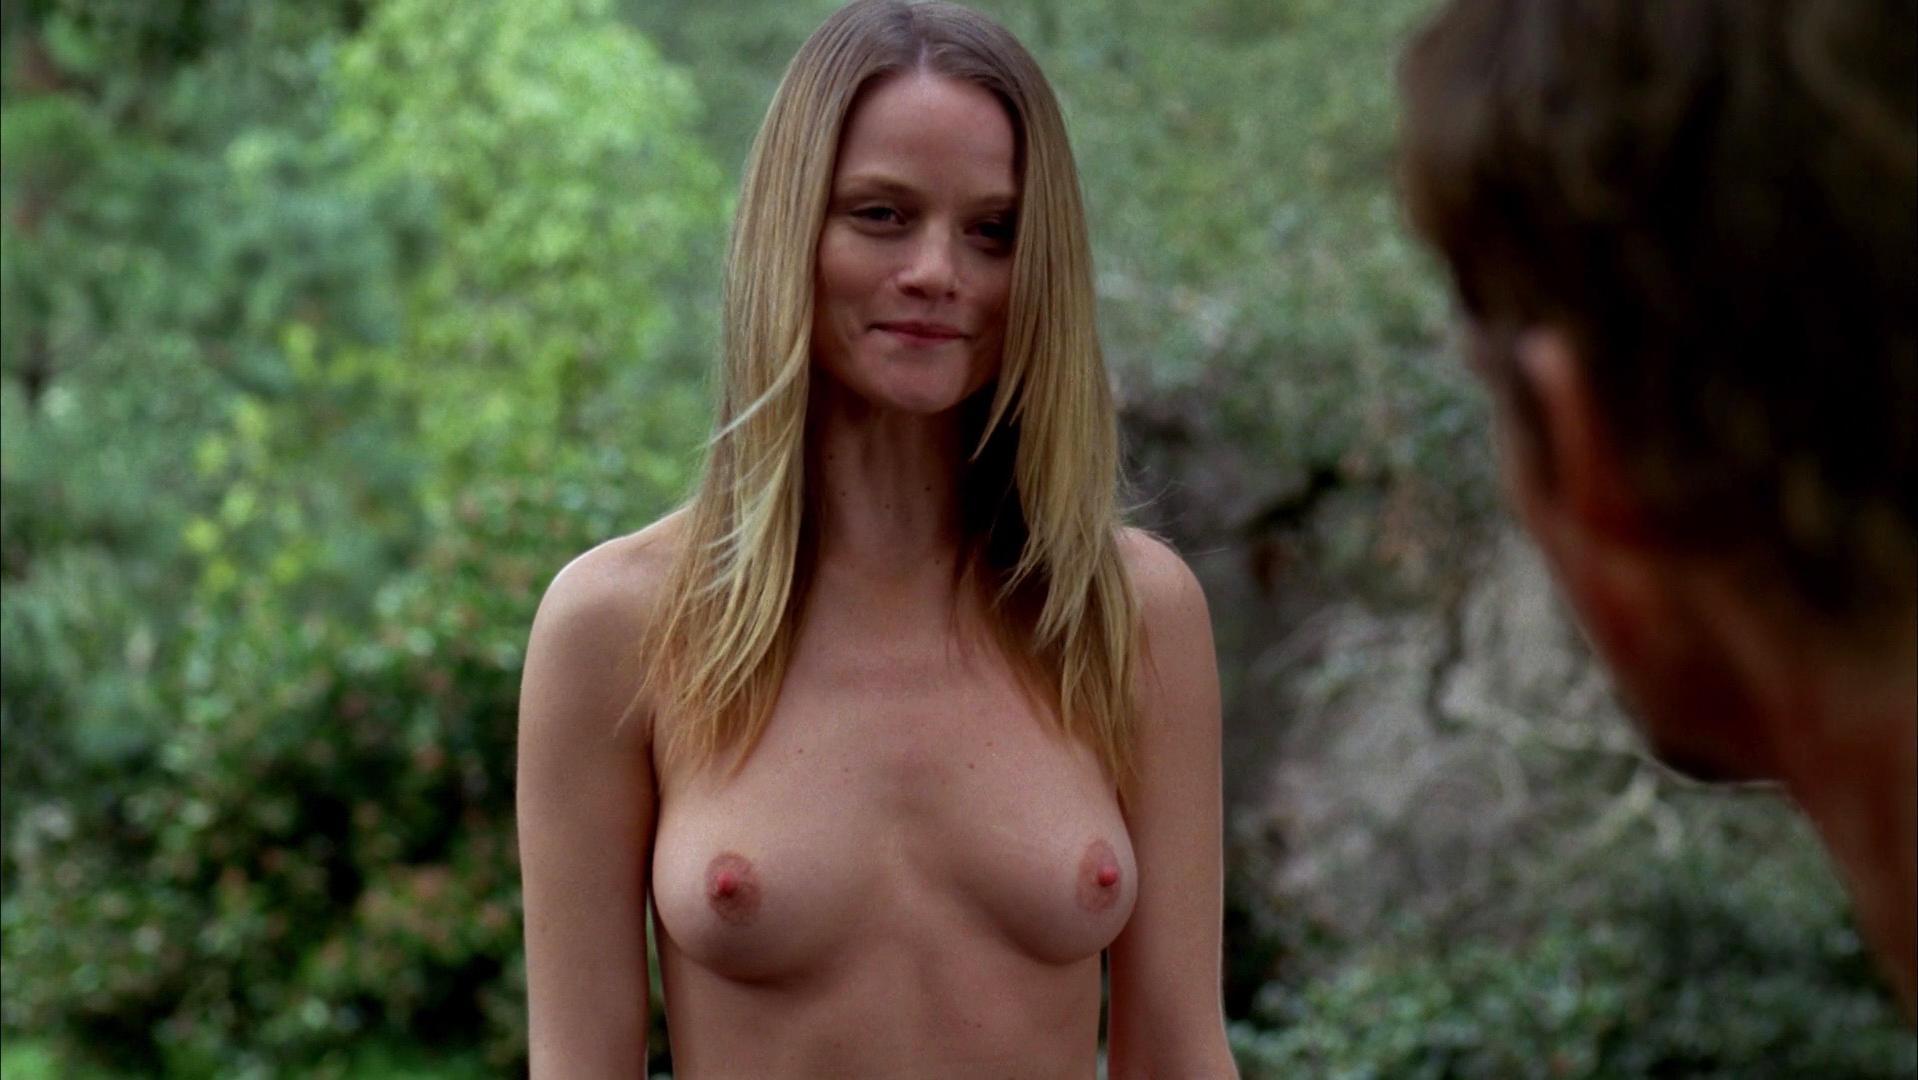 Amy Lindsay Desnuda lindsay pulsipher hot naked pics - photos and other amusements.